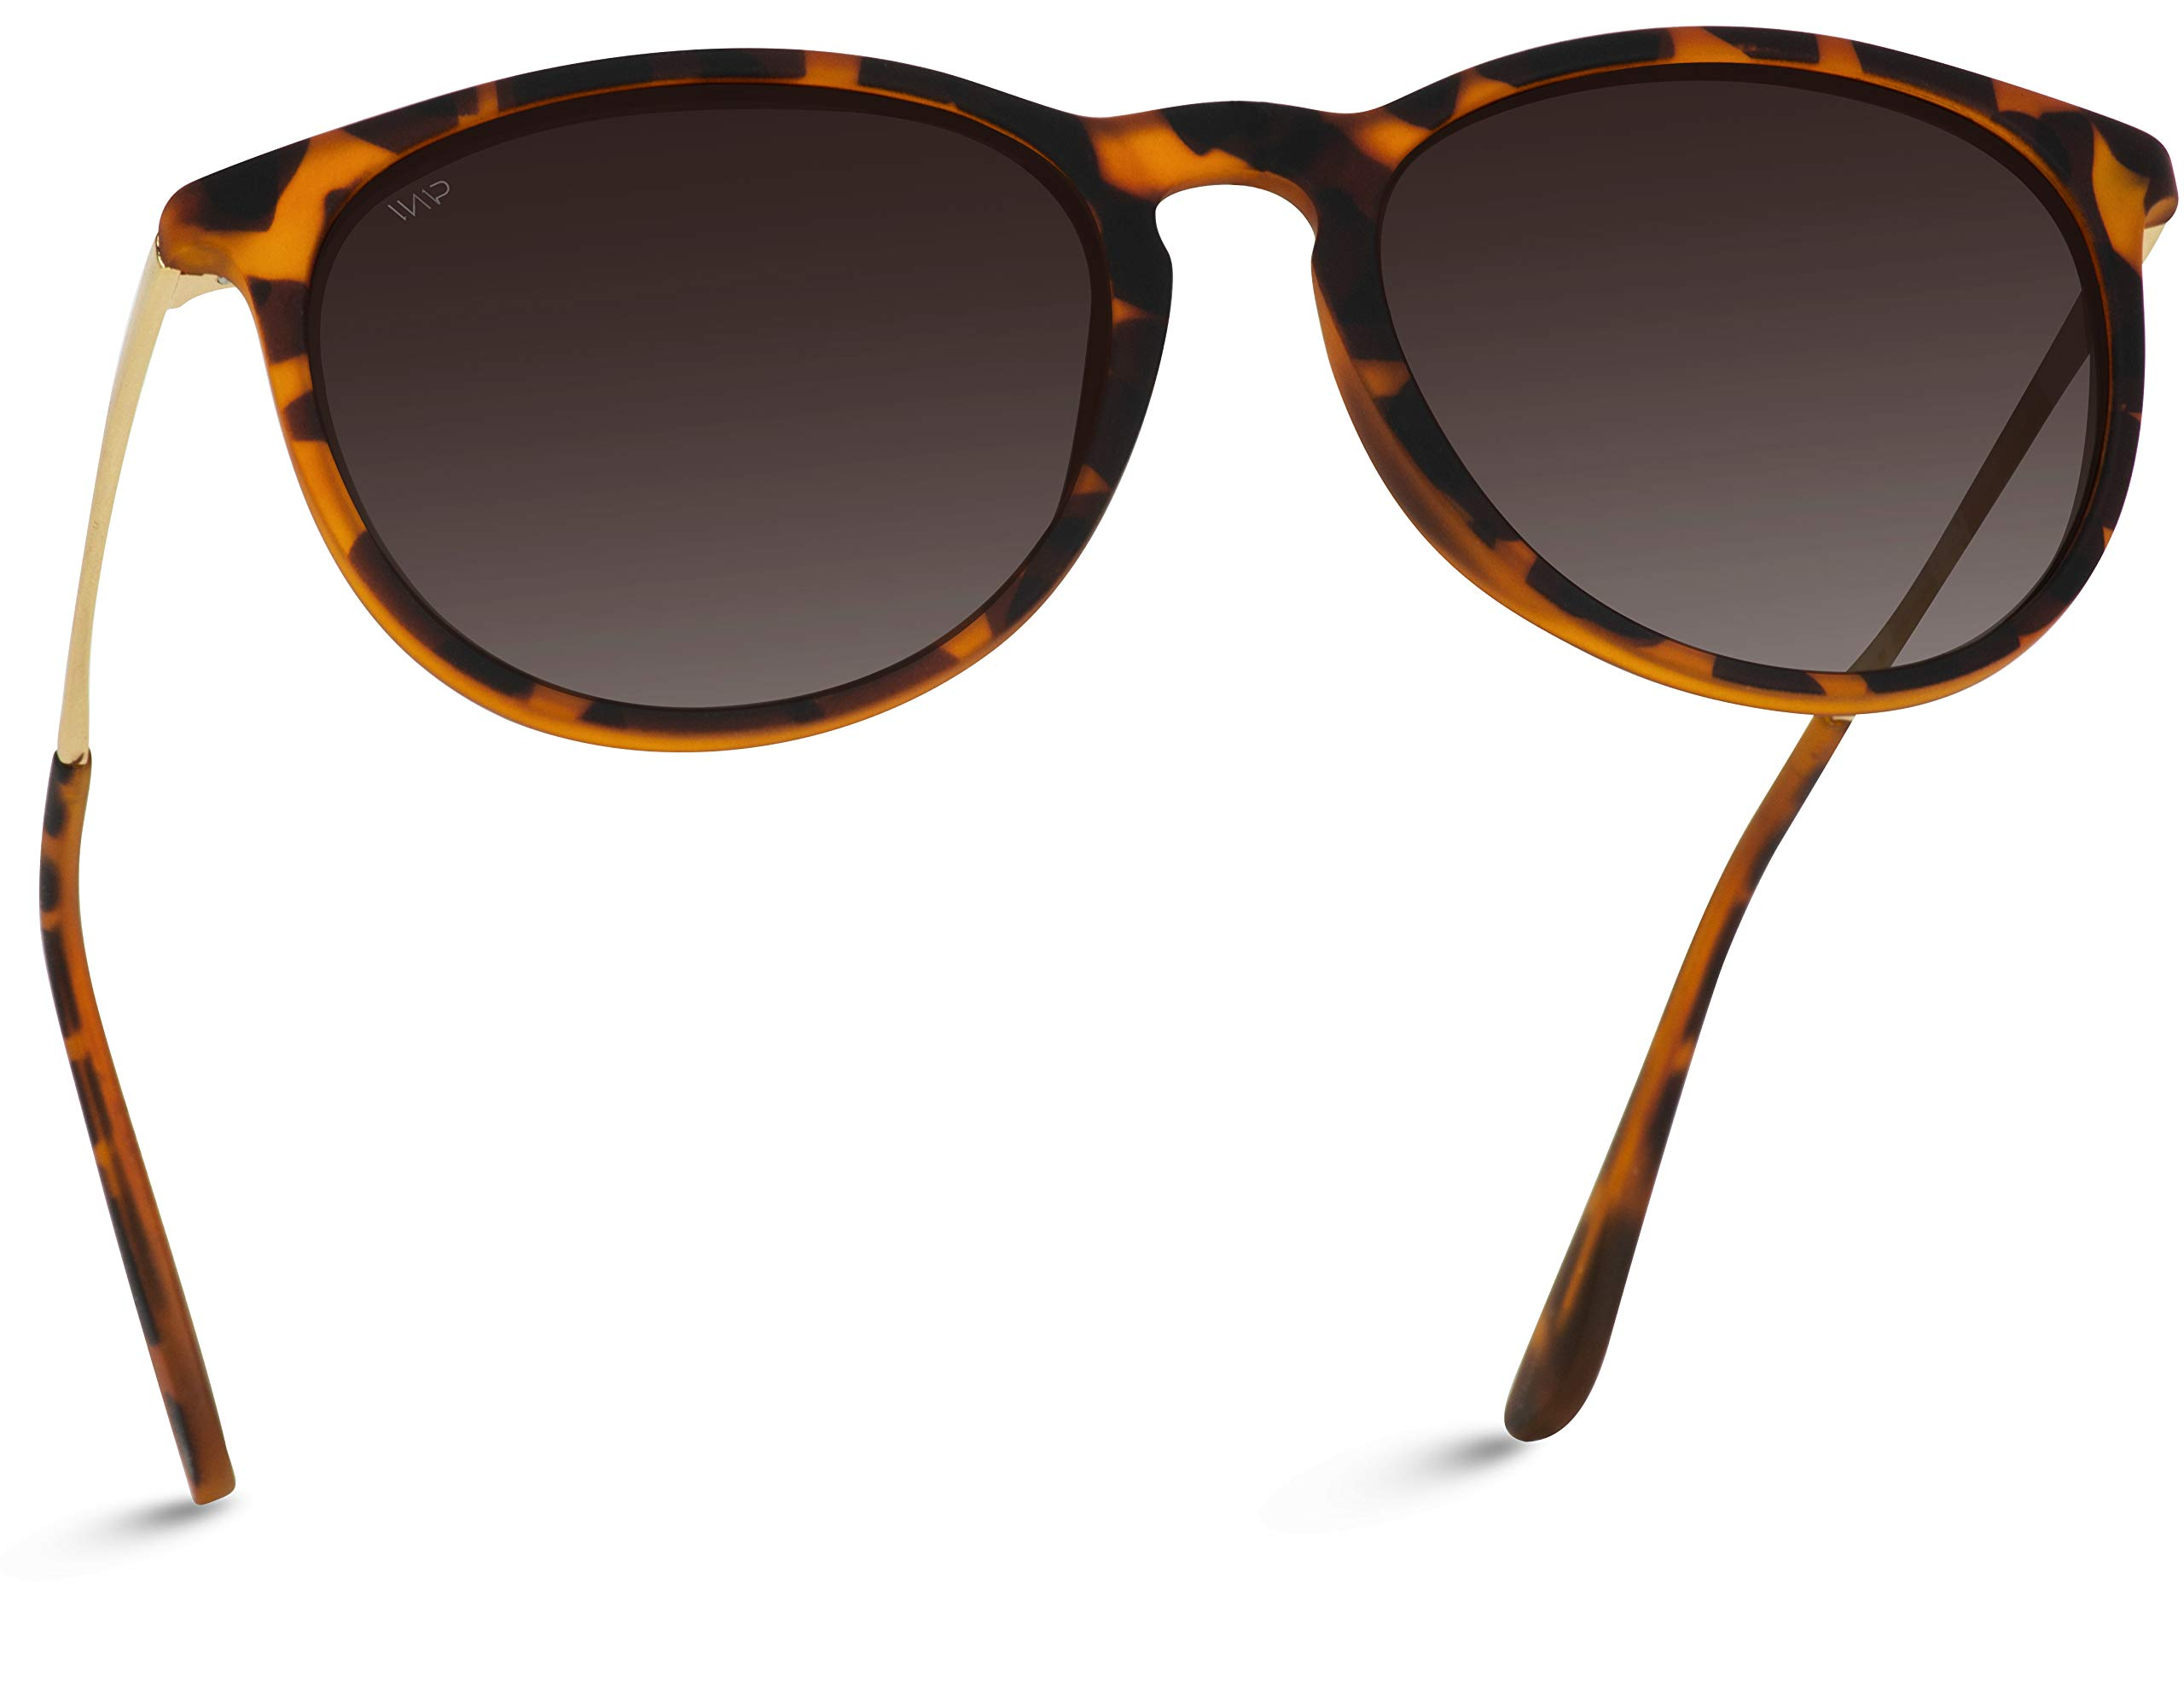 WearMe Pro EXCLUSIVE - Round Retro Polarized Lens Classic Sunglasses for Women by WearMe Pro